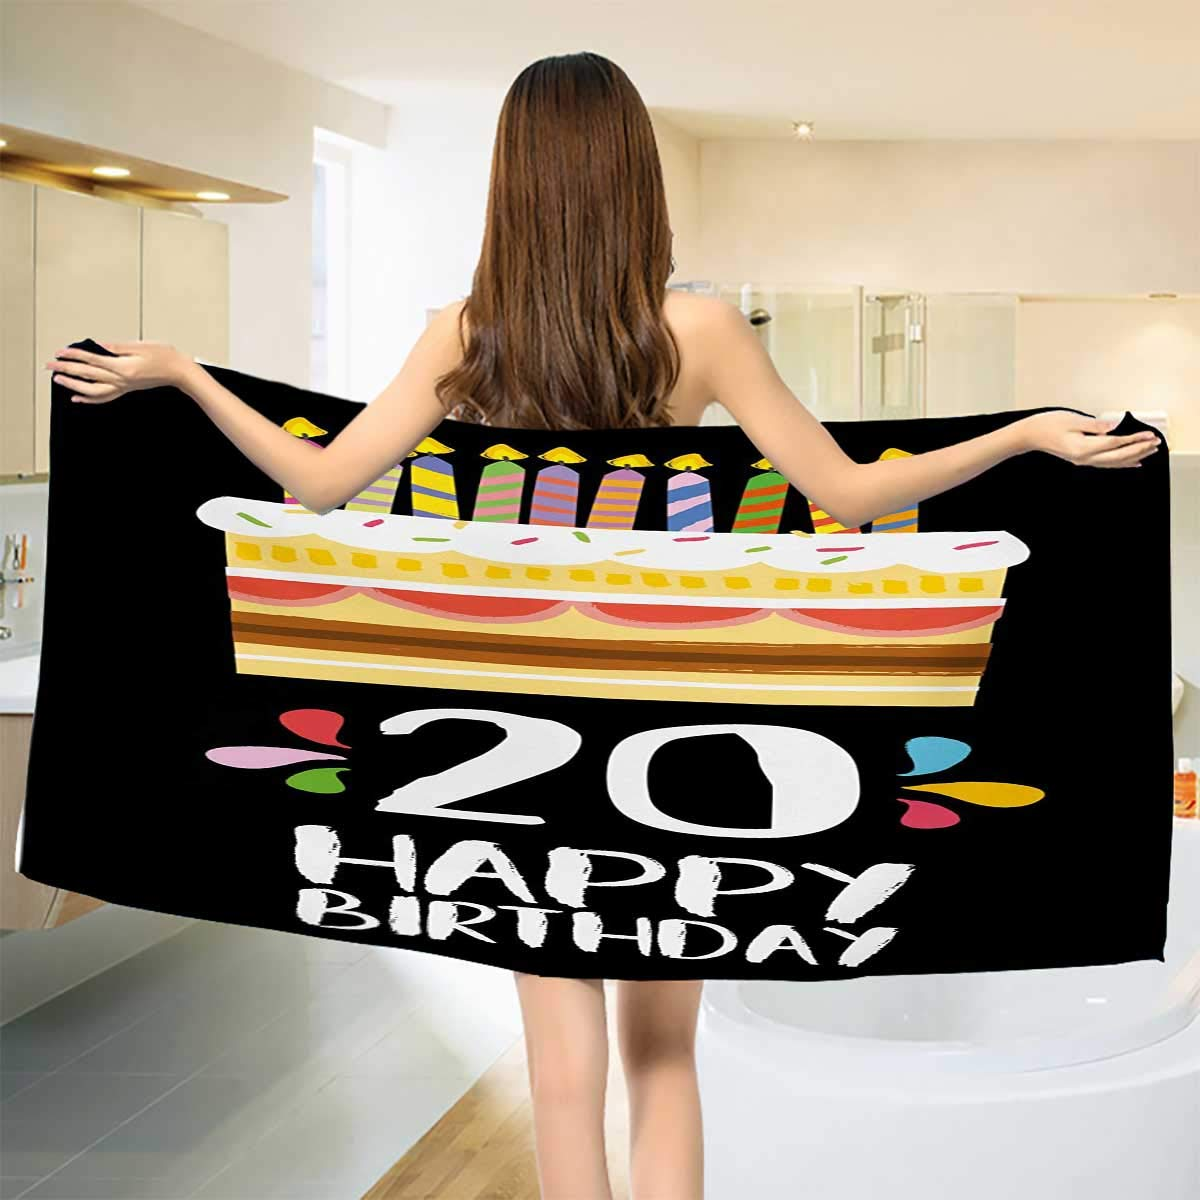 Chaneyhouse 2020-誕生日、タオル、スイートトゥエンティサプライズパーティーテーマ 抽象的な背景のイメージ、速乾プリントマイクロファイバー、Vemilion、ホットピンクサイズ:幅10 x 長さ10 インチ W 27.5